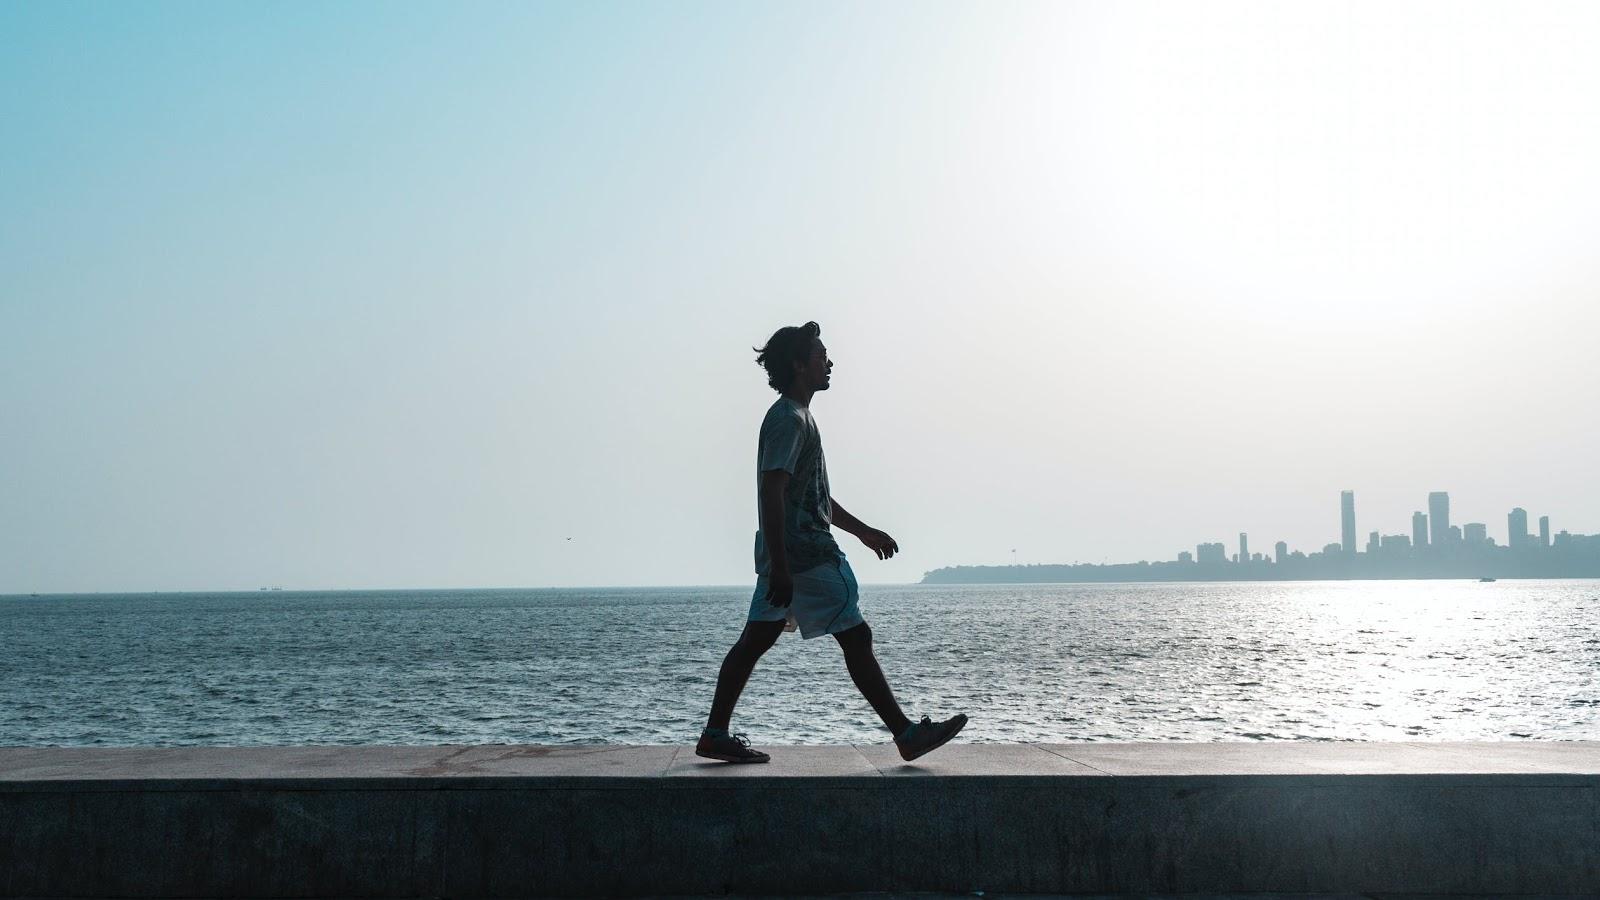 Guys silhouette walking next to water